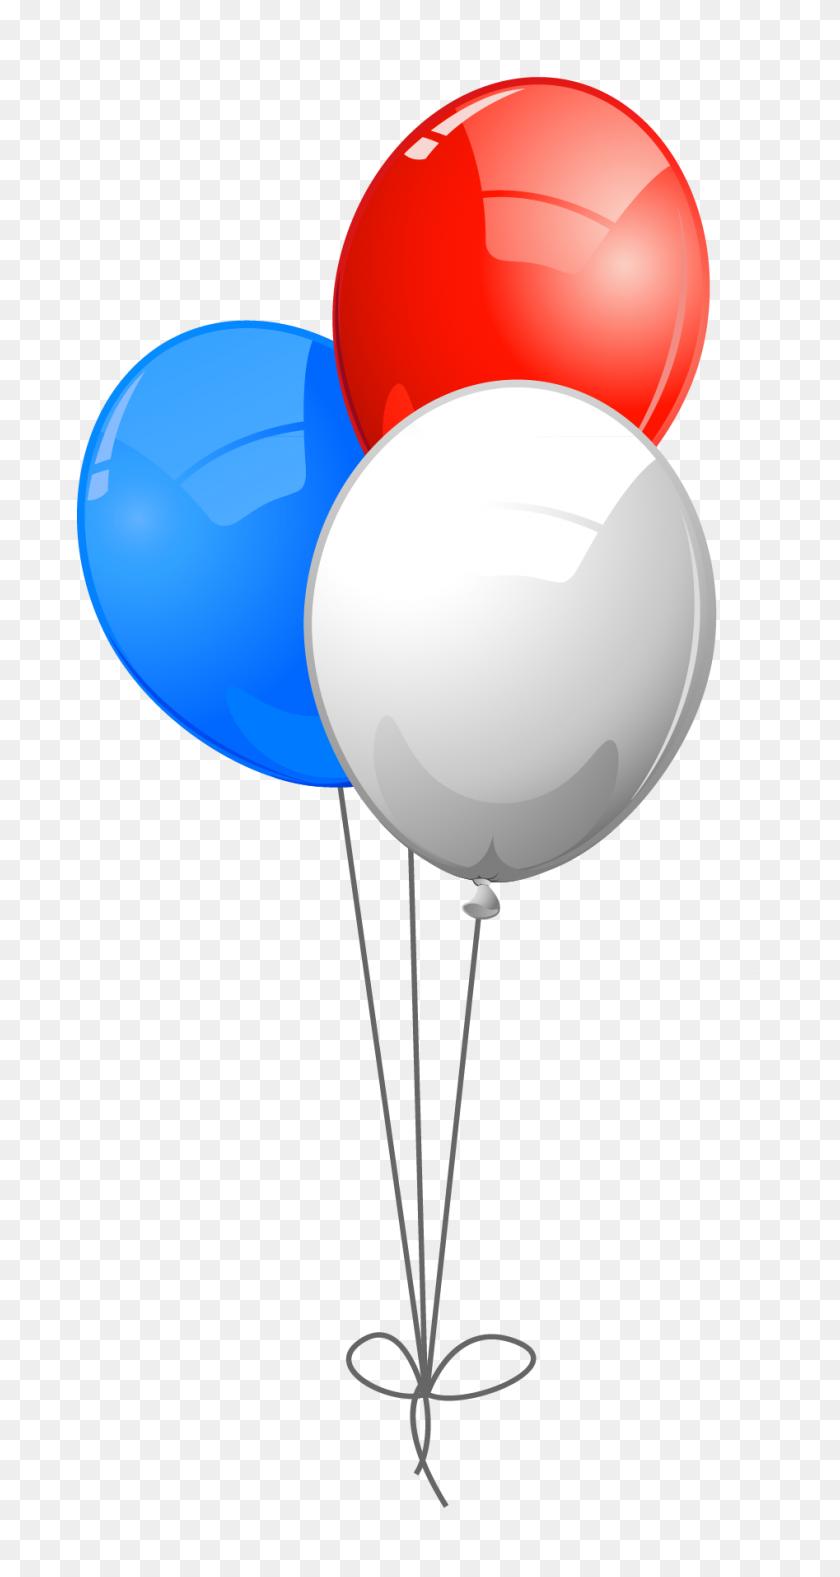 Usa Colors Balloons Png - Usa Clipart